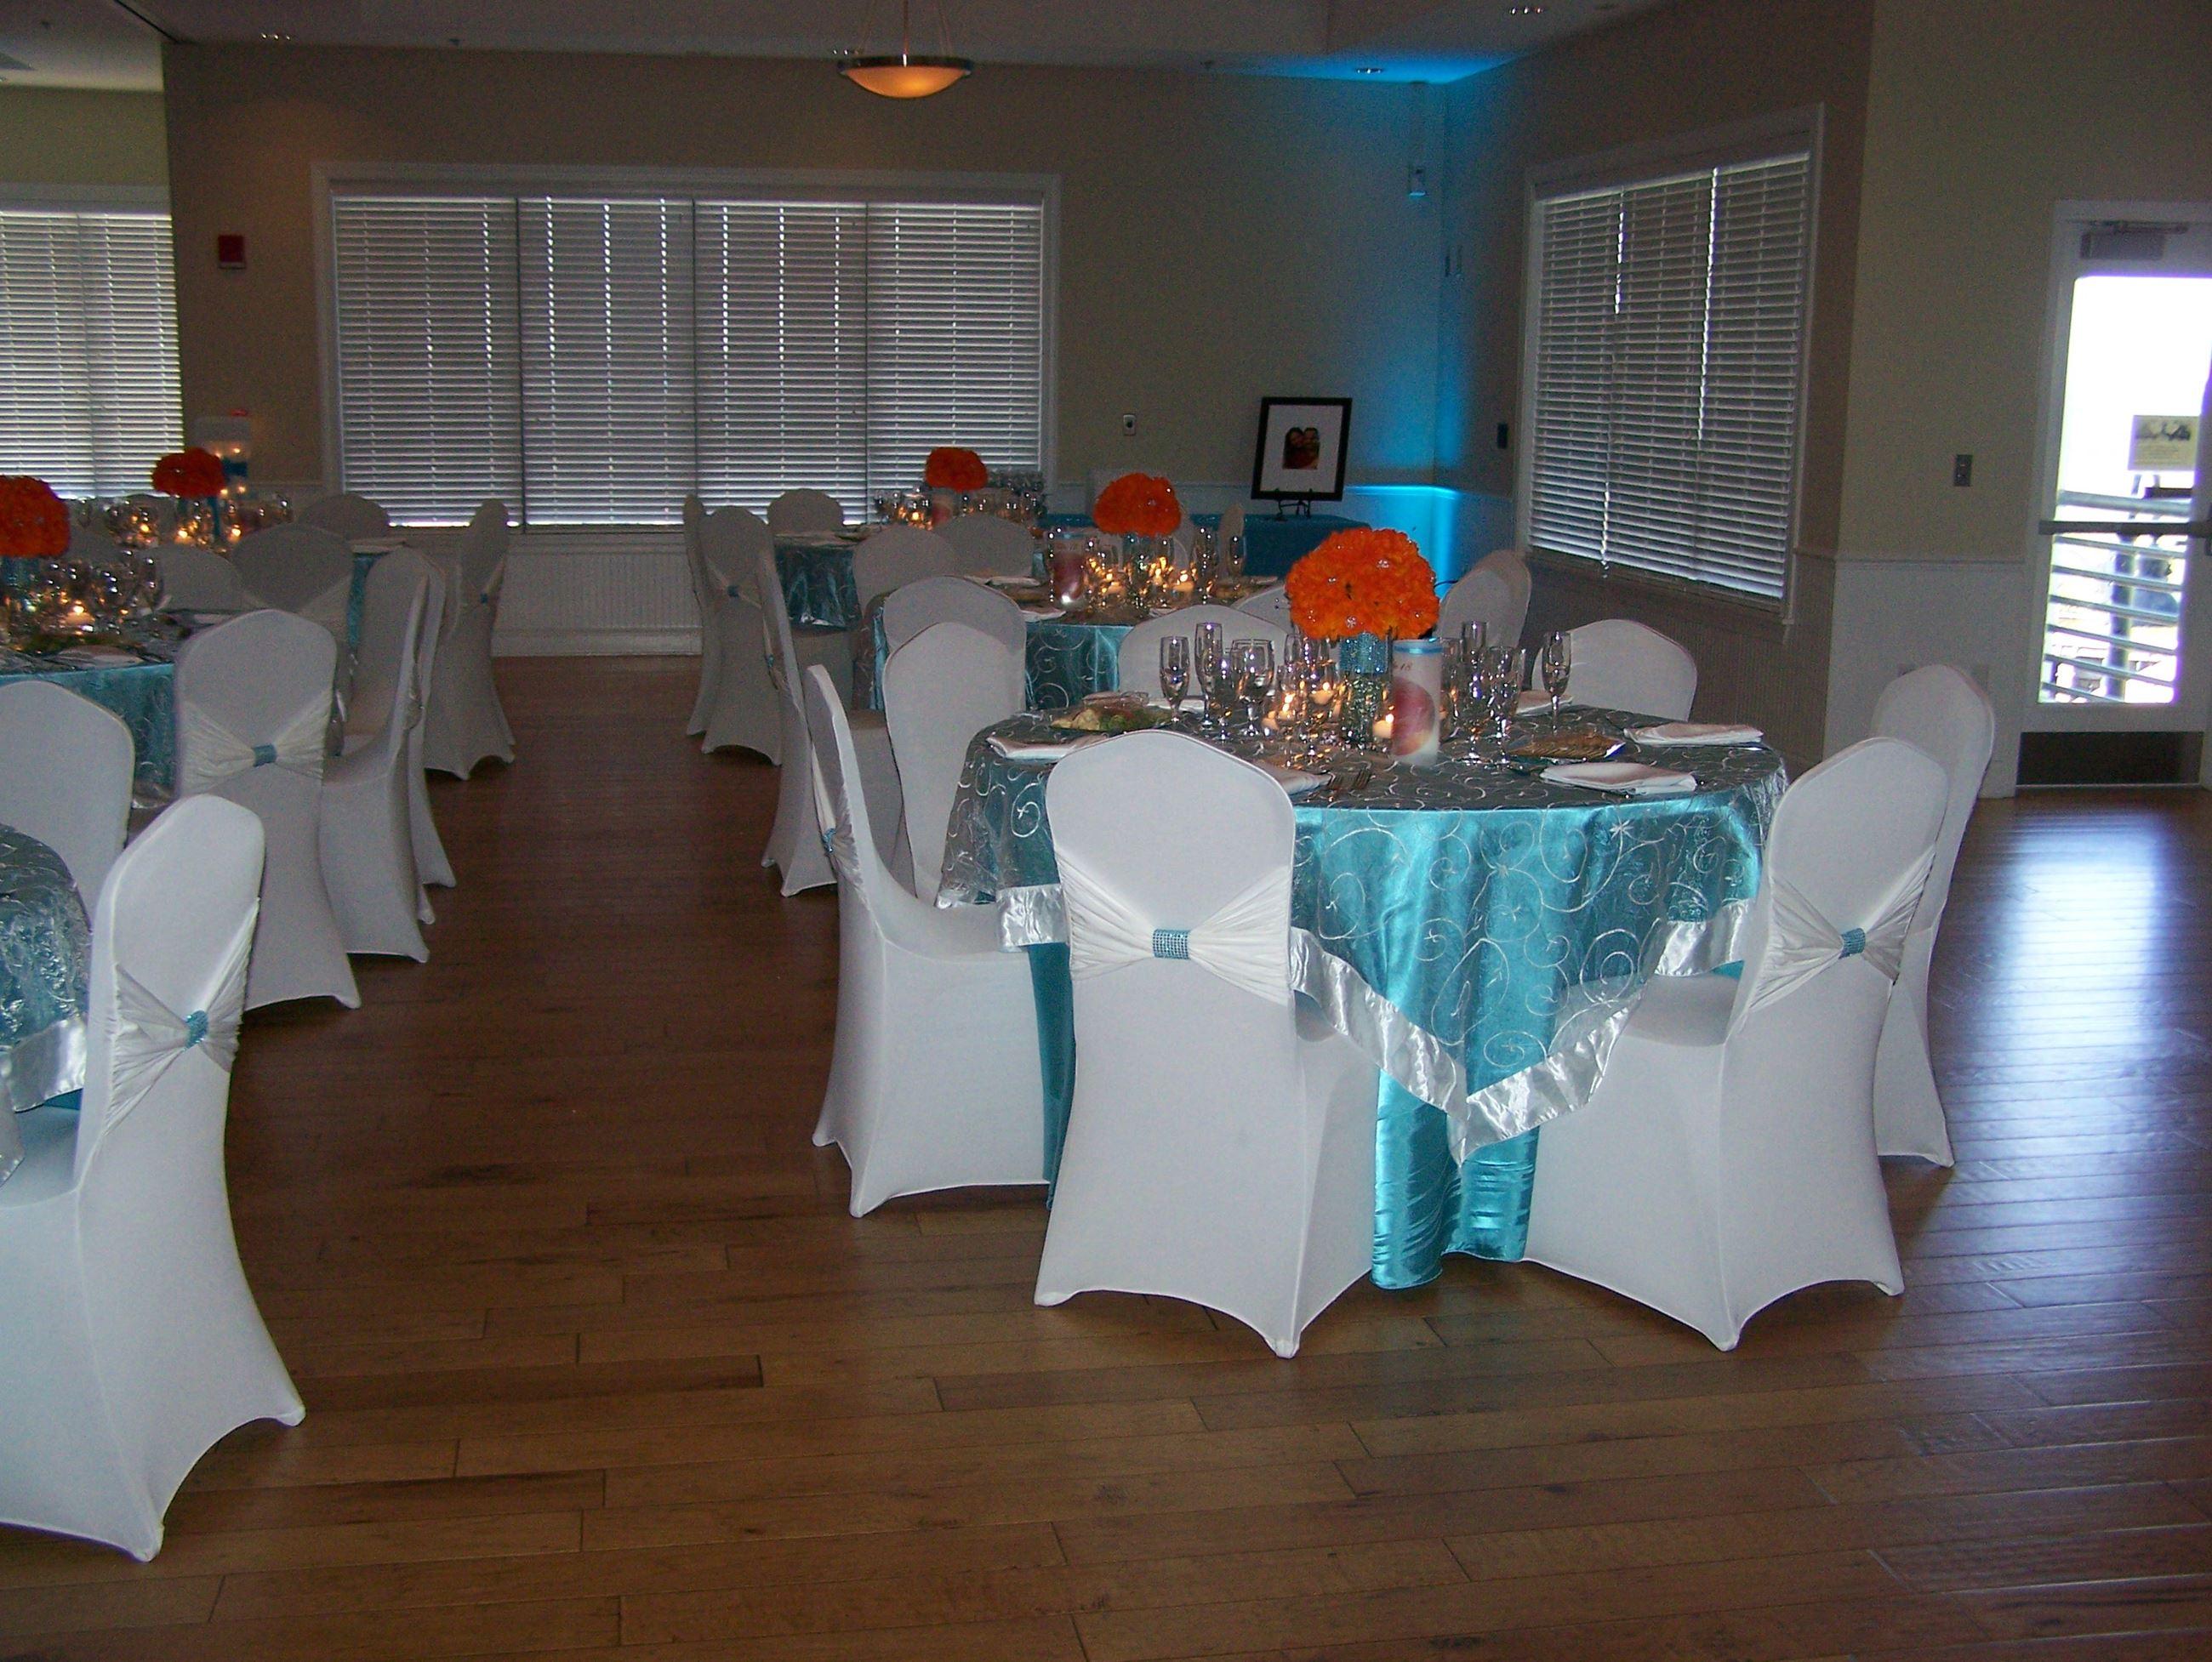 Marina Banquet Hall   City of St  Cloud, Florida - Official Website